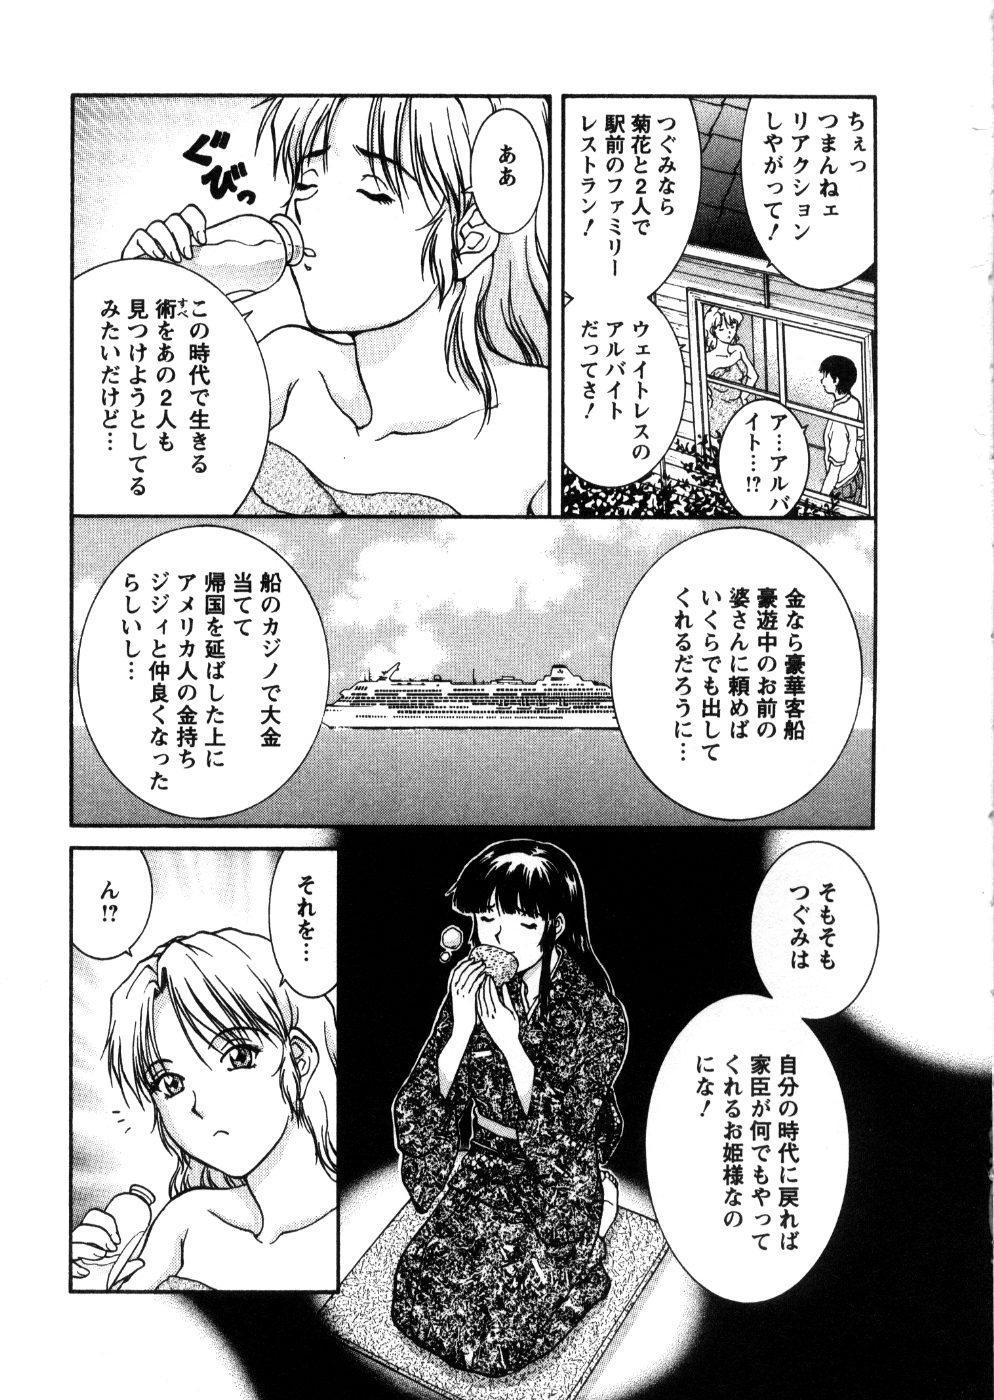 Oneechan-tachi ga Yatte Kuru 03 72